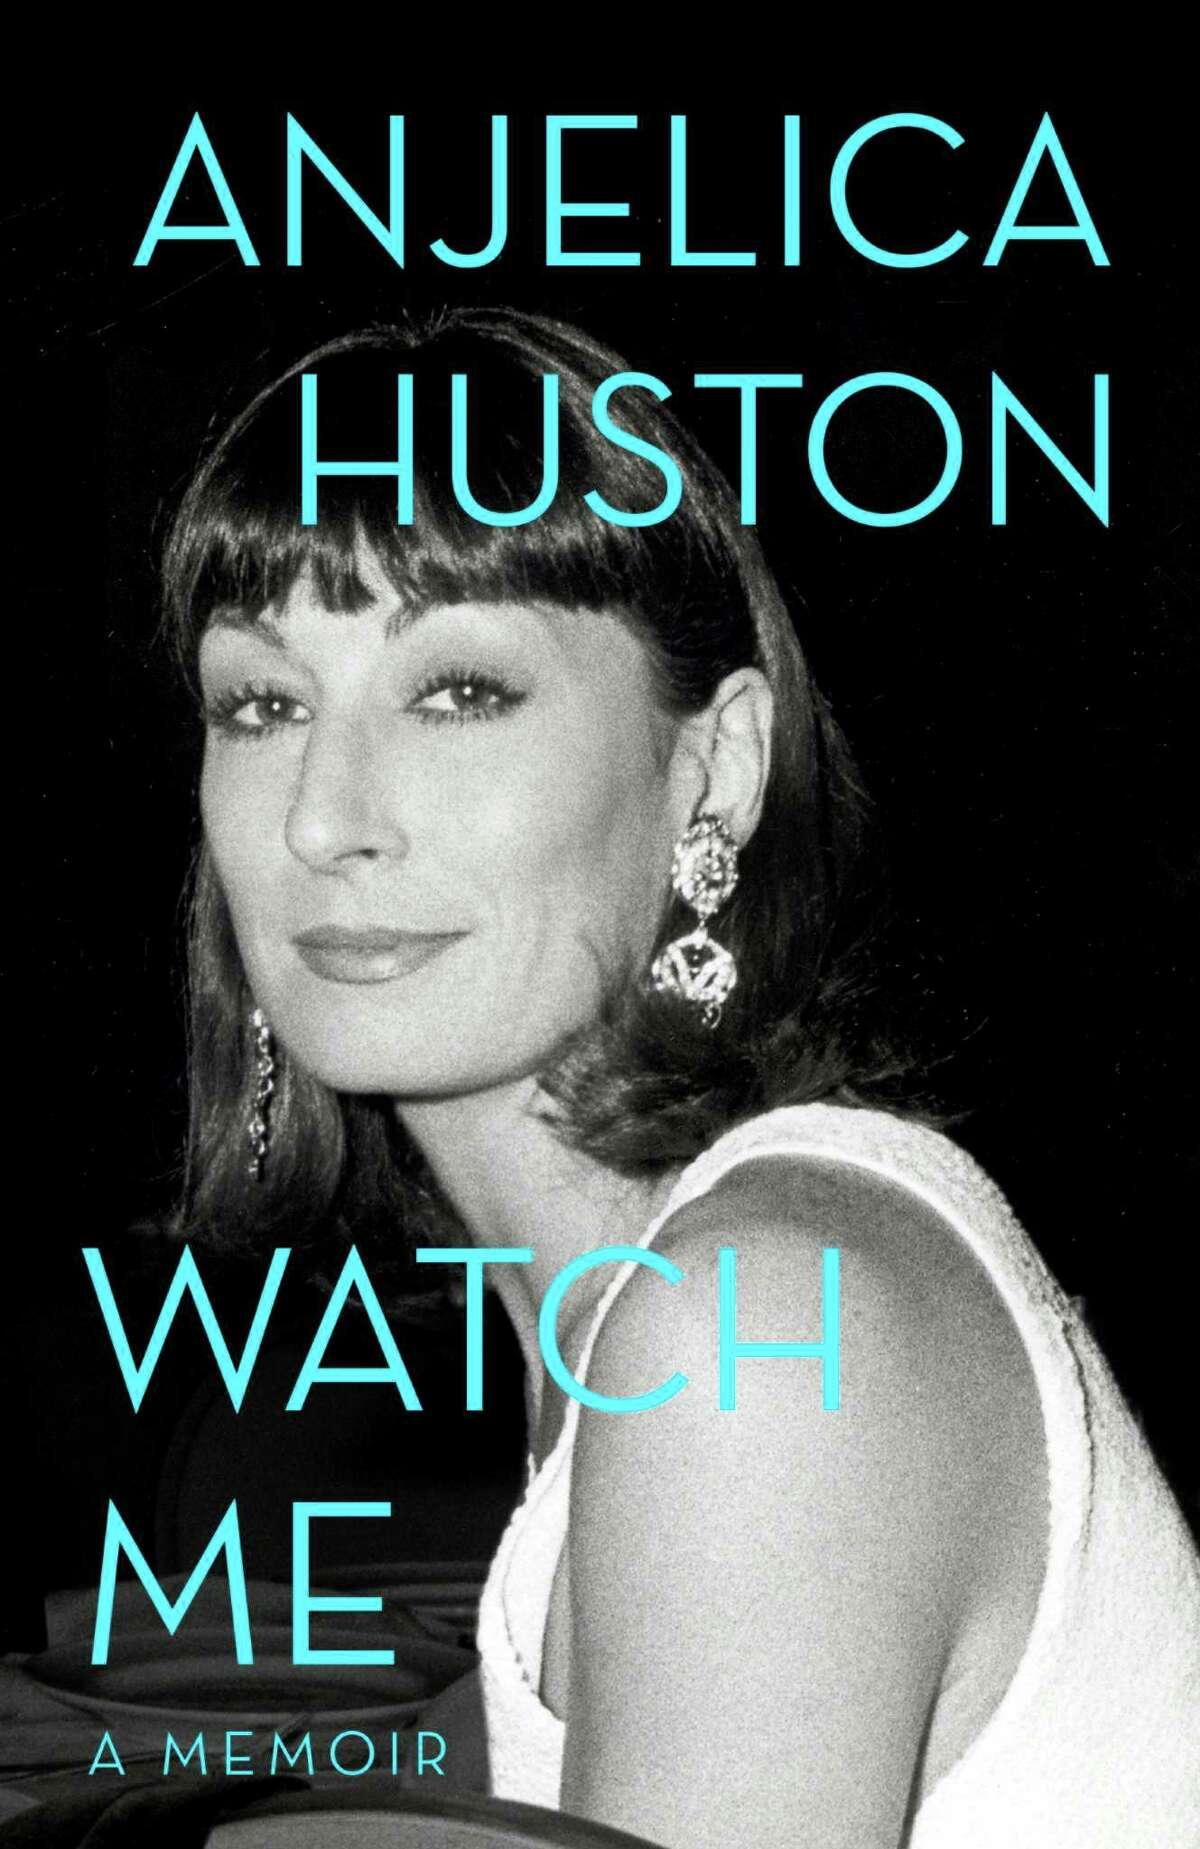 The second of Anjelica Huston's two-volume memoir.